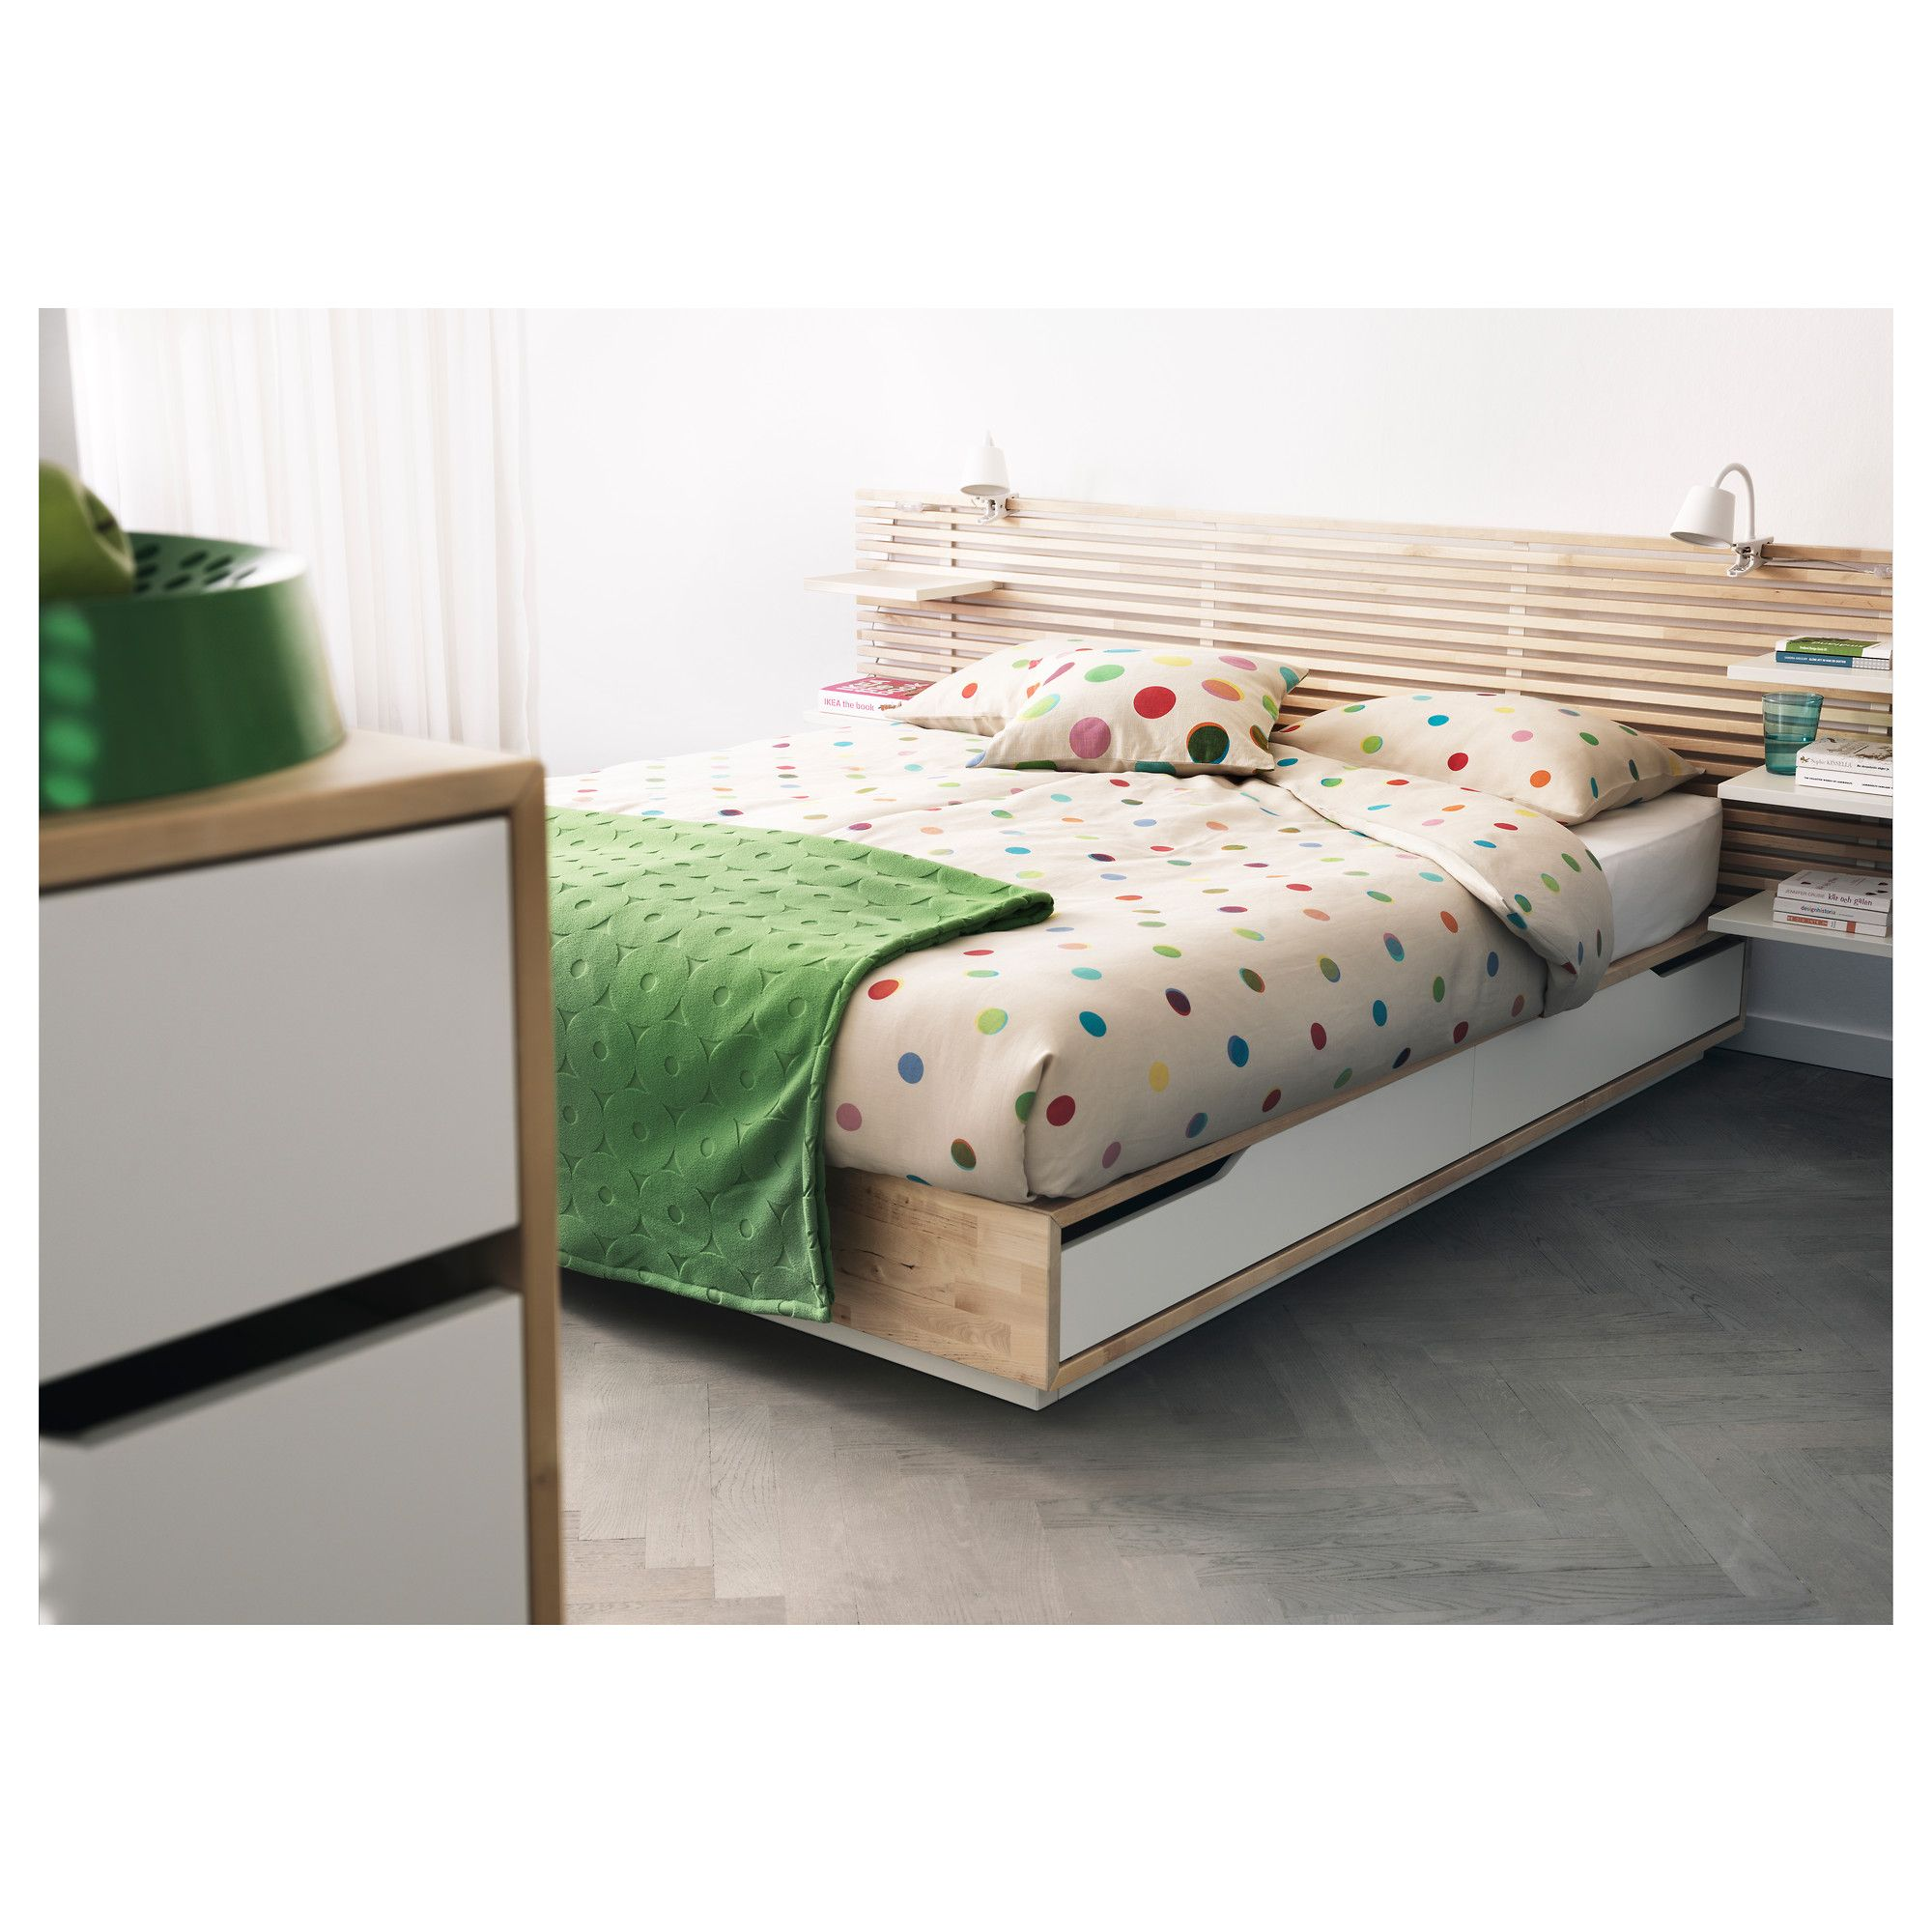 MANDAL σκελετός κρεβατιού με αποθηκευτικό χώρο, 902.804.83 Ikea Mandal Bed,  Bed Ikea